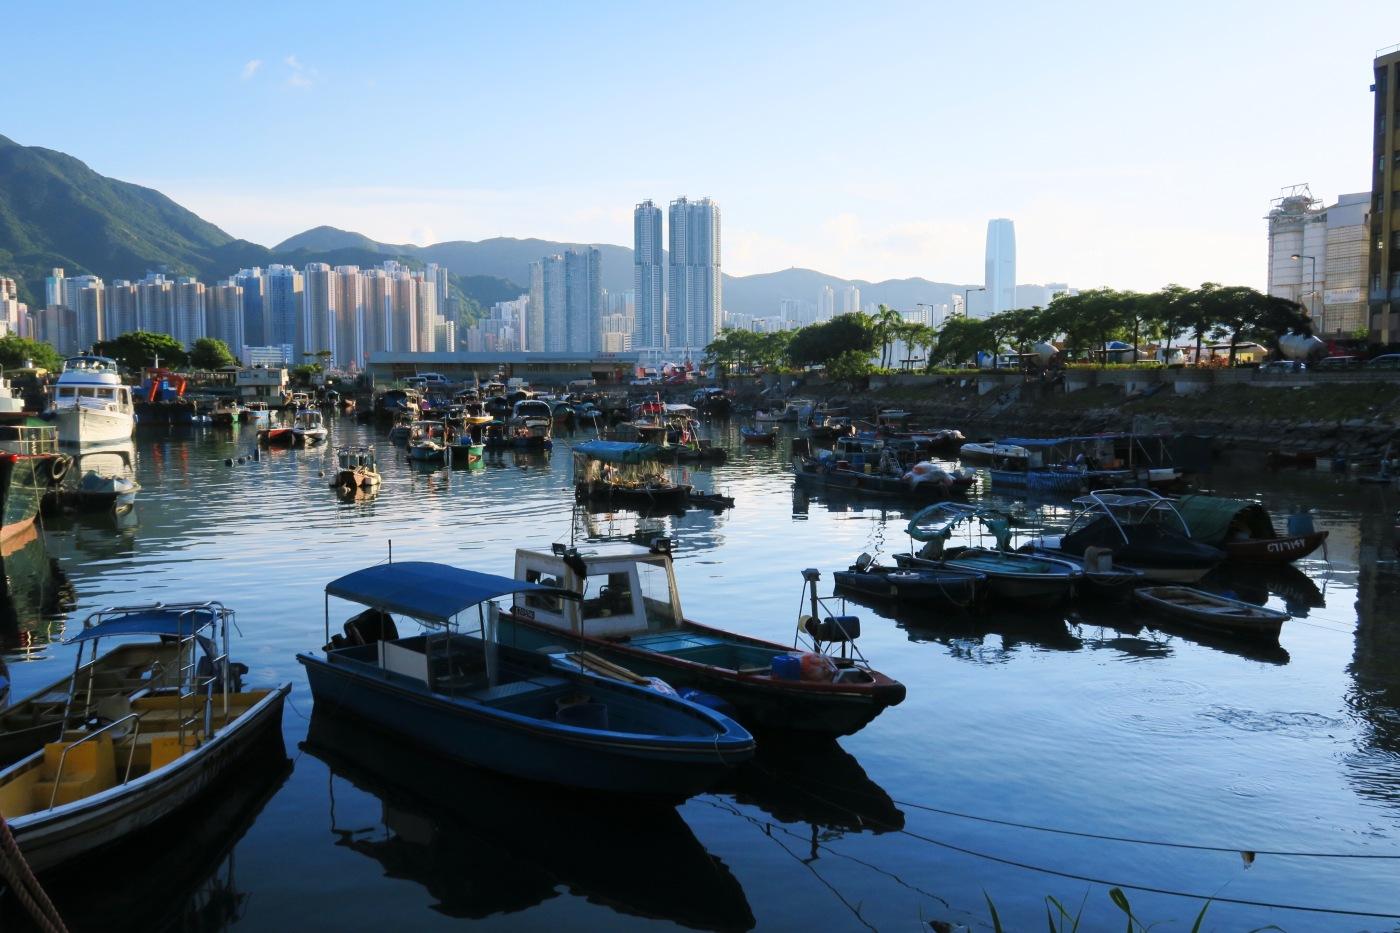 Lei Yue Mun Hong Kong